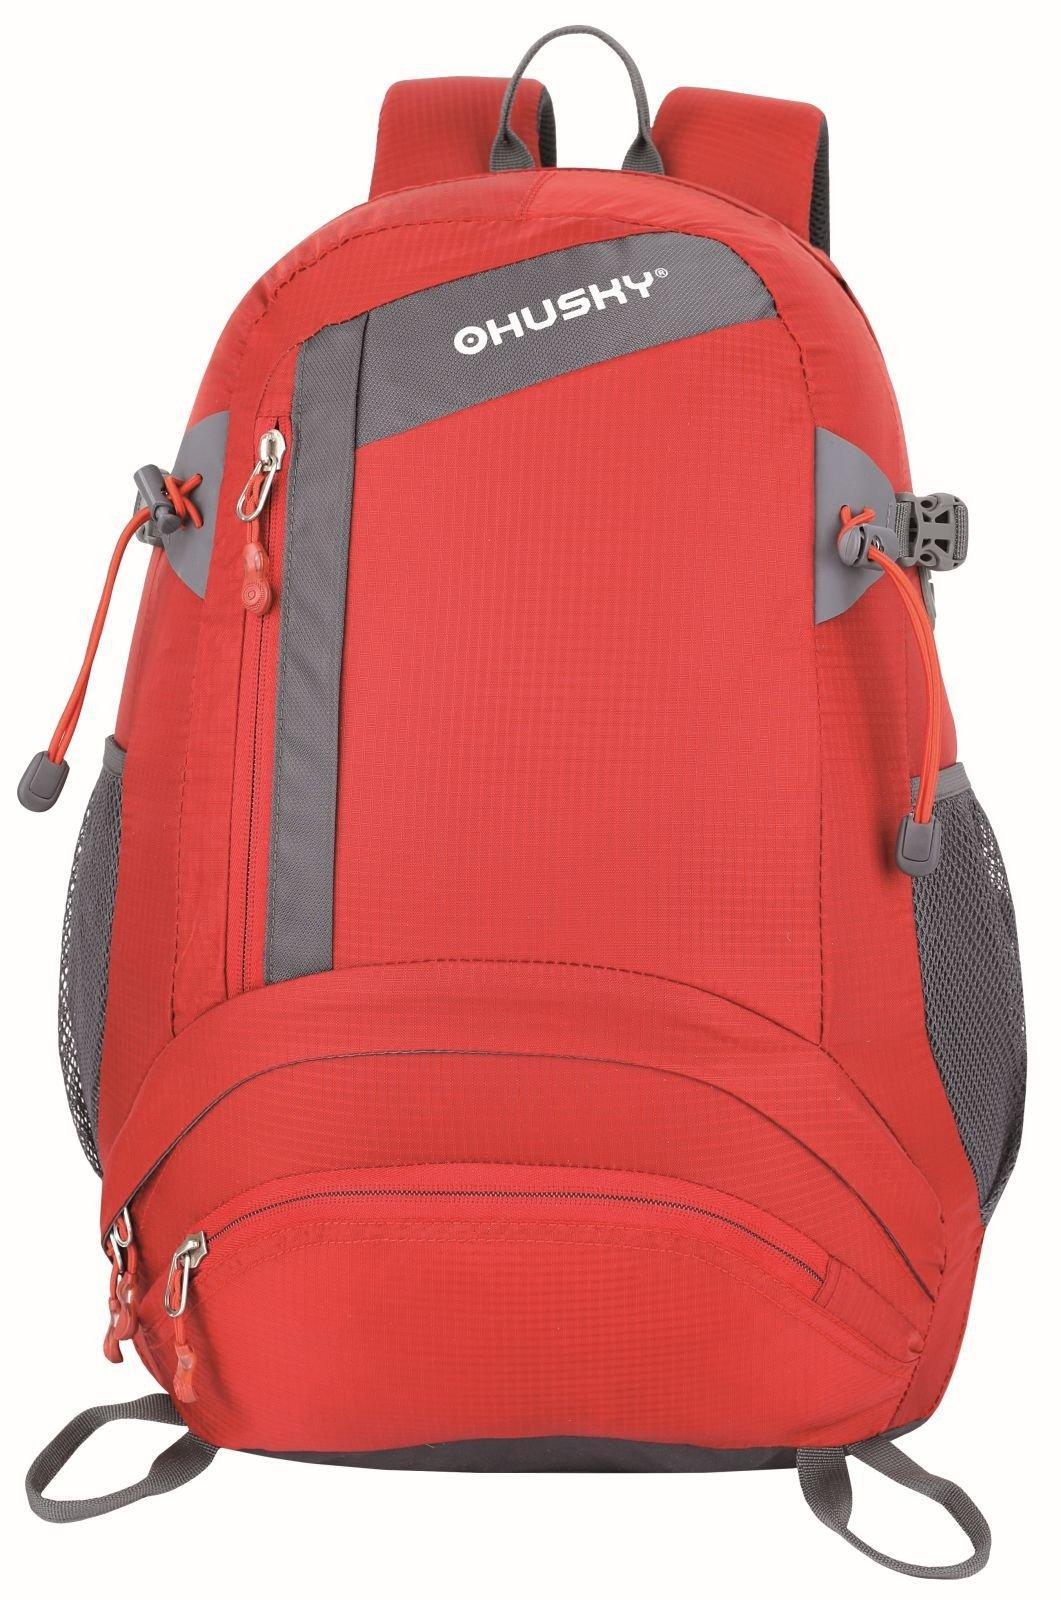 Husky Stingy 28l